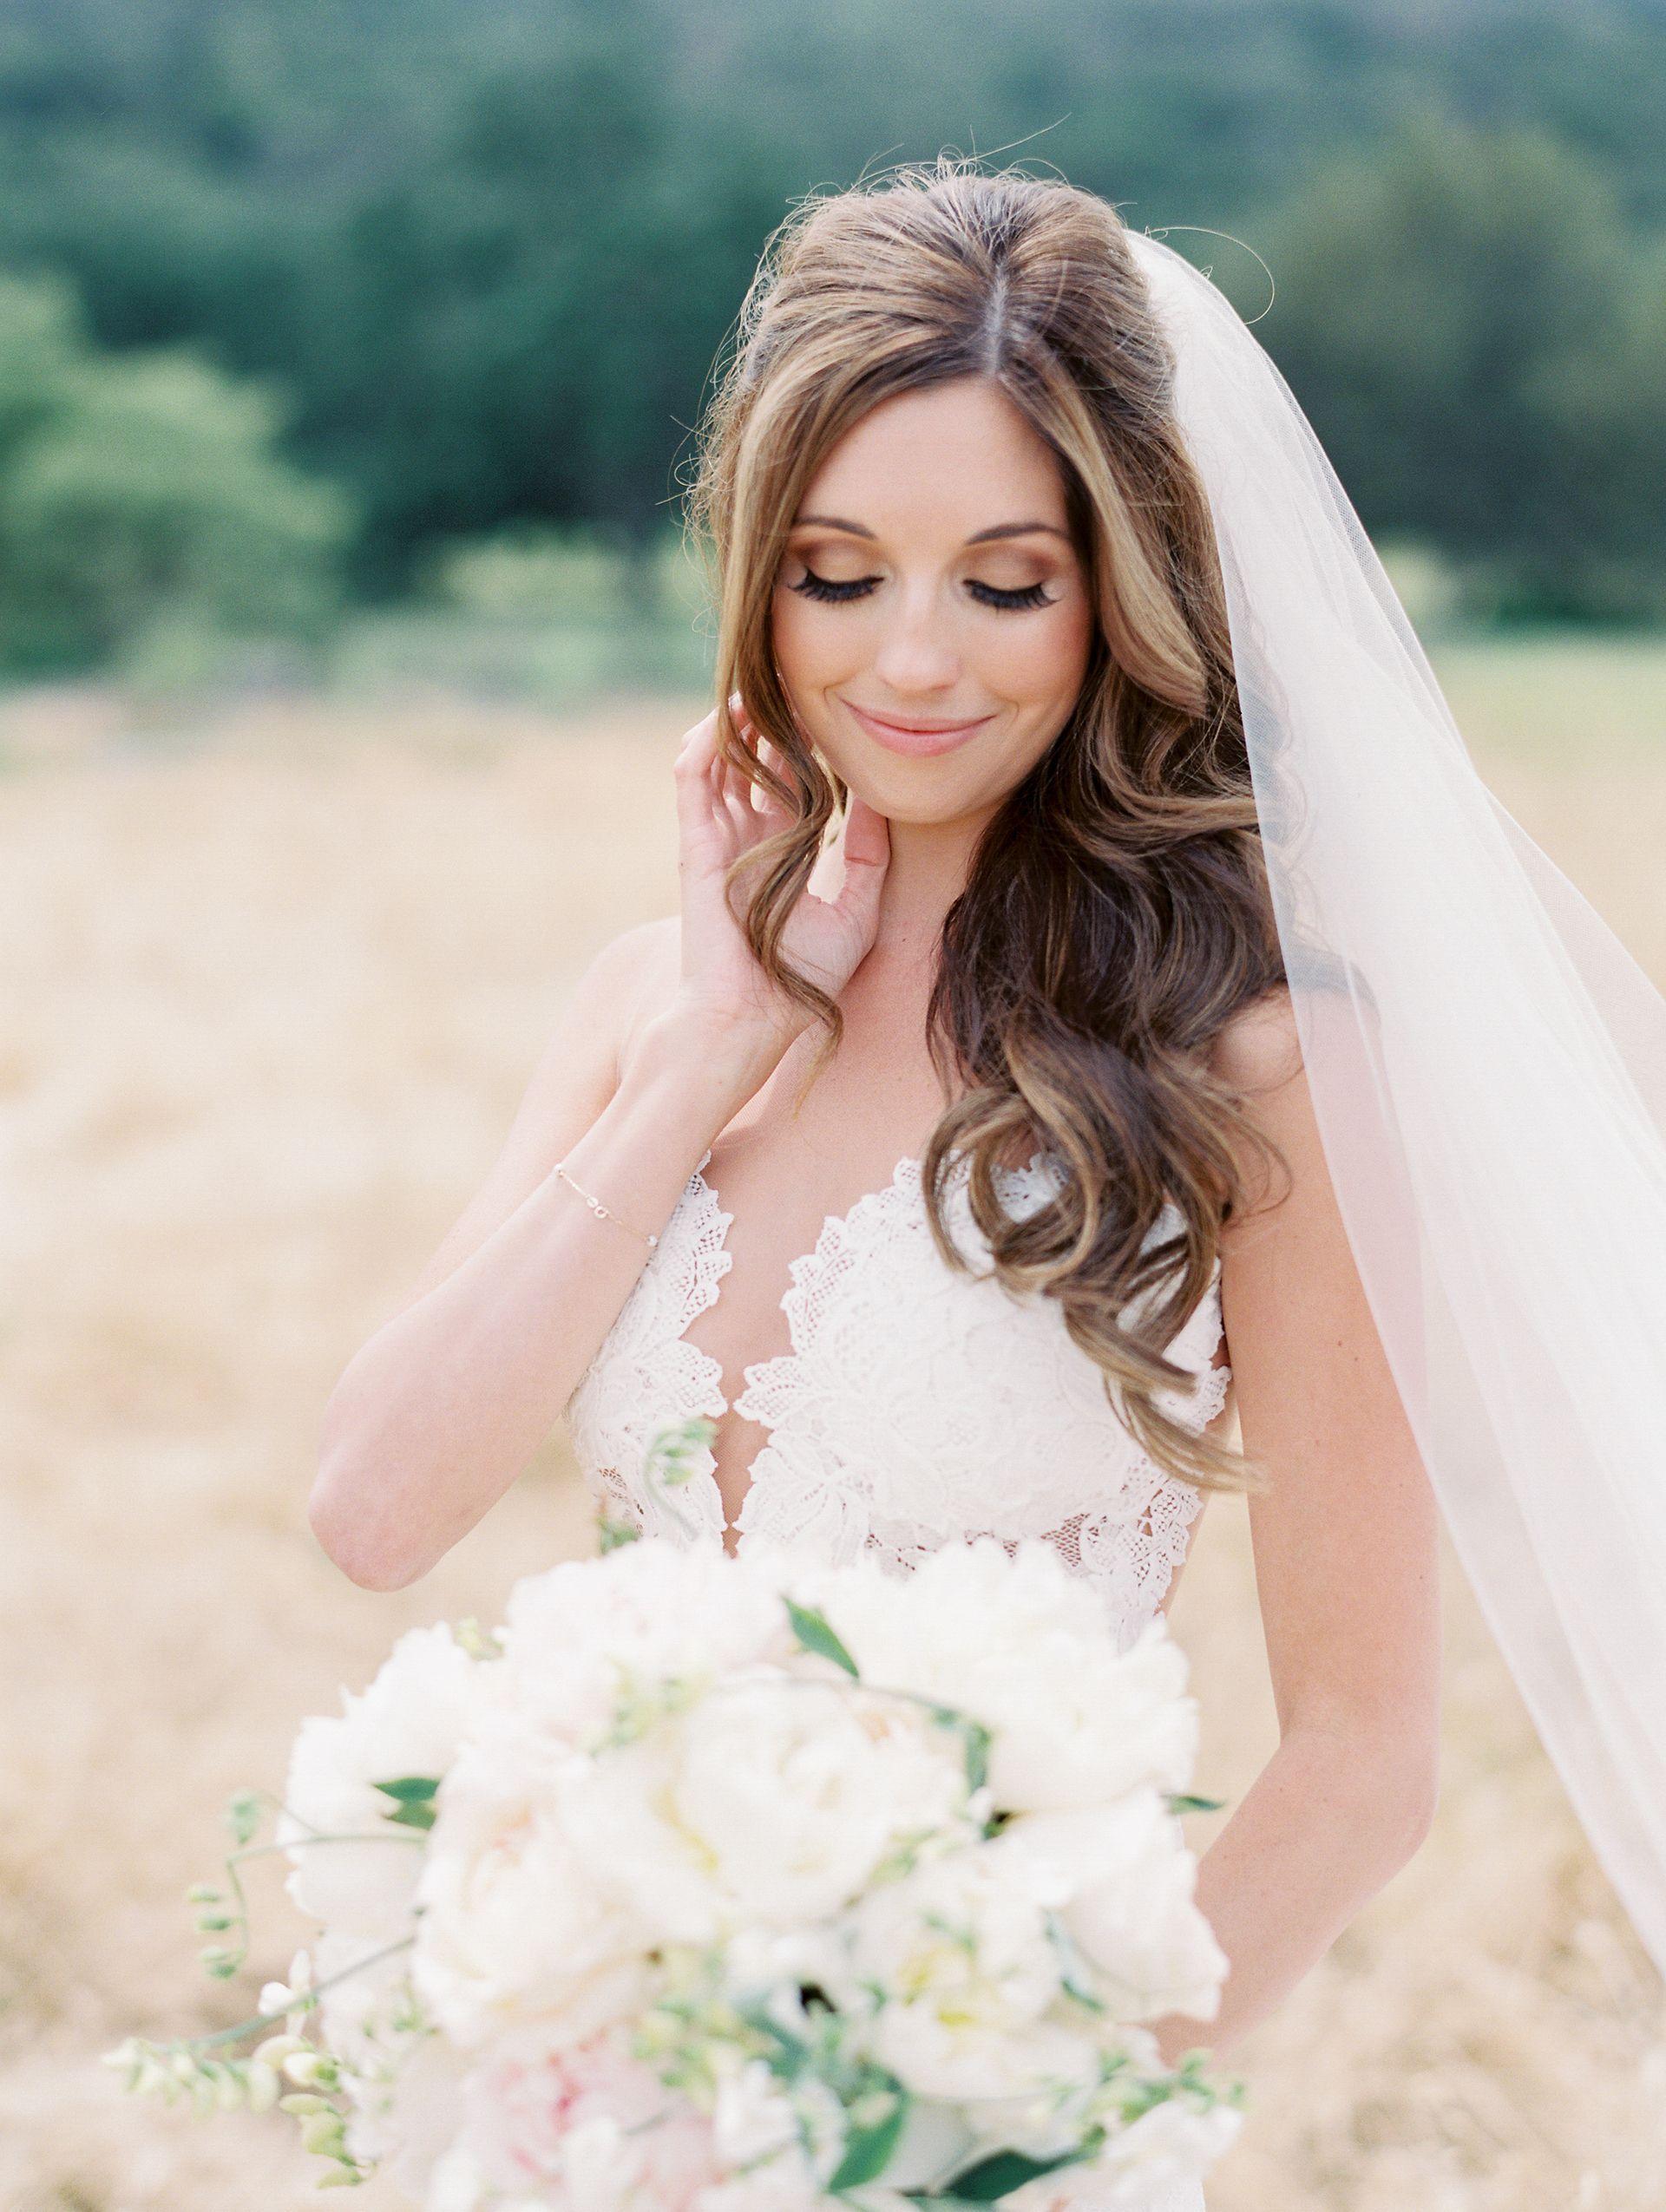 Teased Half Up Do Romantic Bridal Curls Classic Veil Wedding